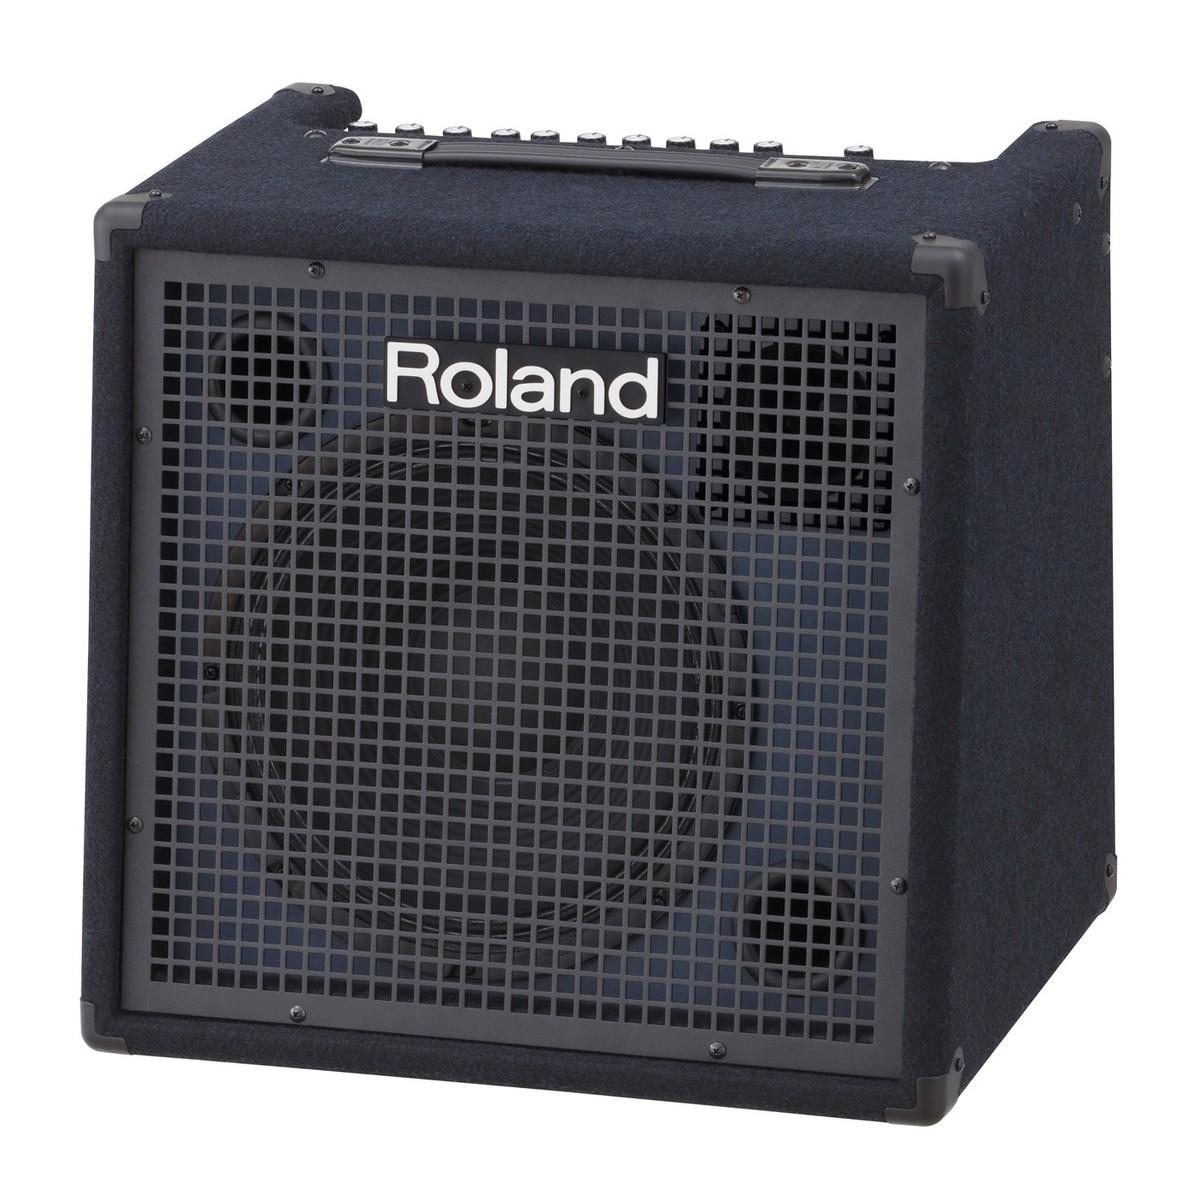 roland kc 400 keyboard amplifier at gear4music. Black Bedroom Furniture Sets. Home Design Ideas